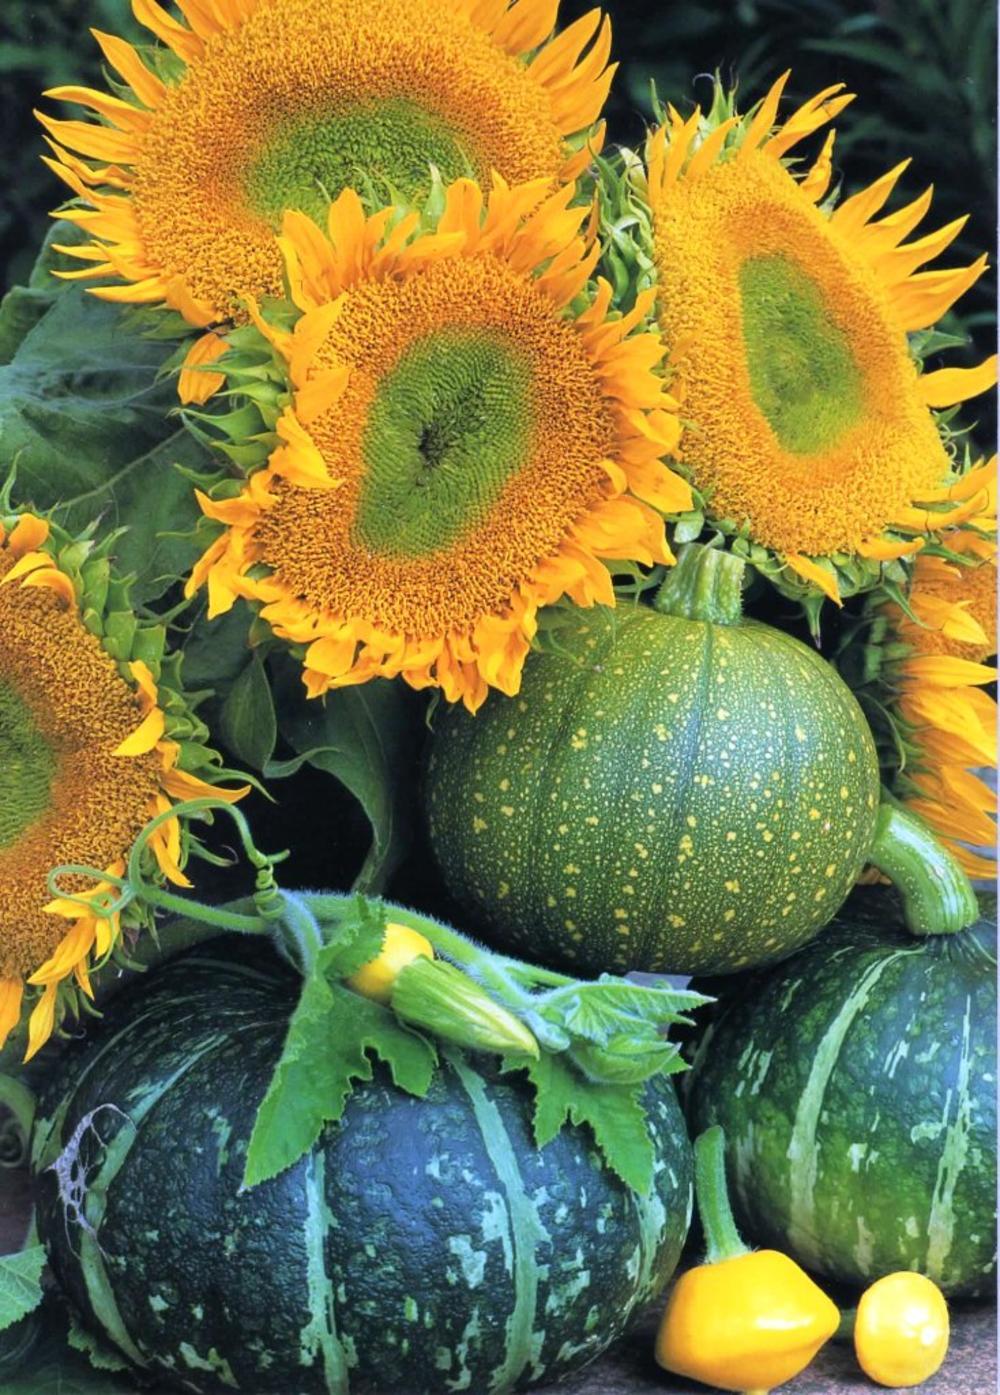 Sunflowers & Pumpkins Photo Art  Greeting Card Blank Inside